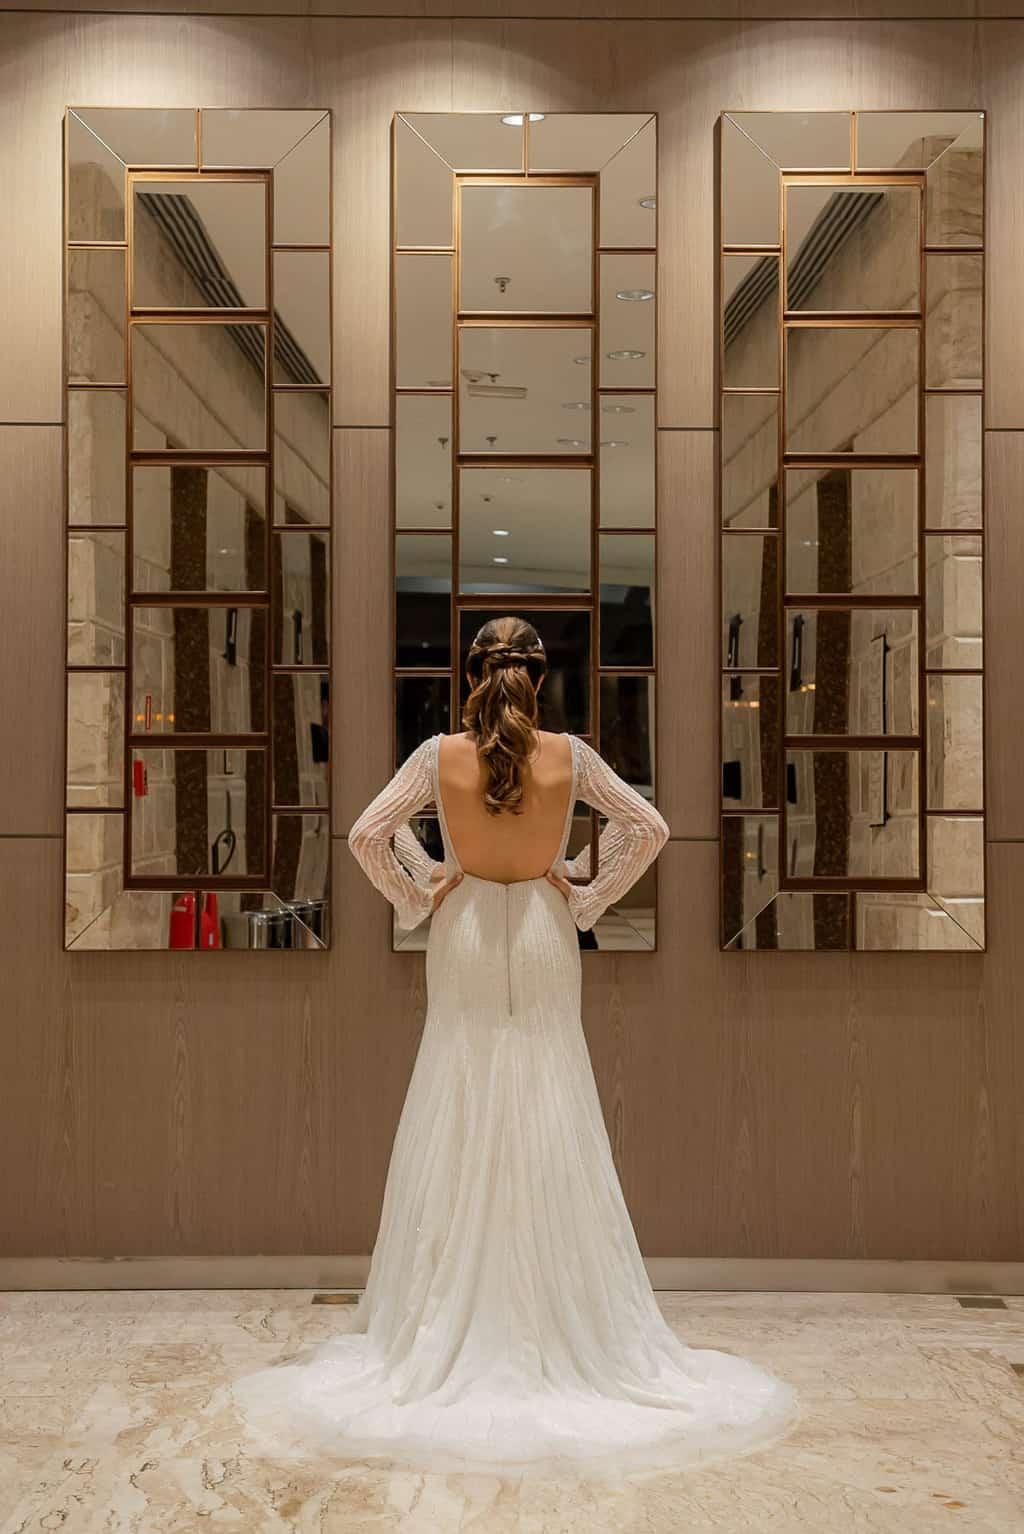 casamento-luiza-e-gustavo-cerimonial-casamento-de-ideias-fotografia-lenine-serejo-making-of-vestido-de-noiva10